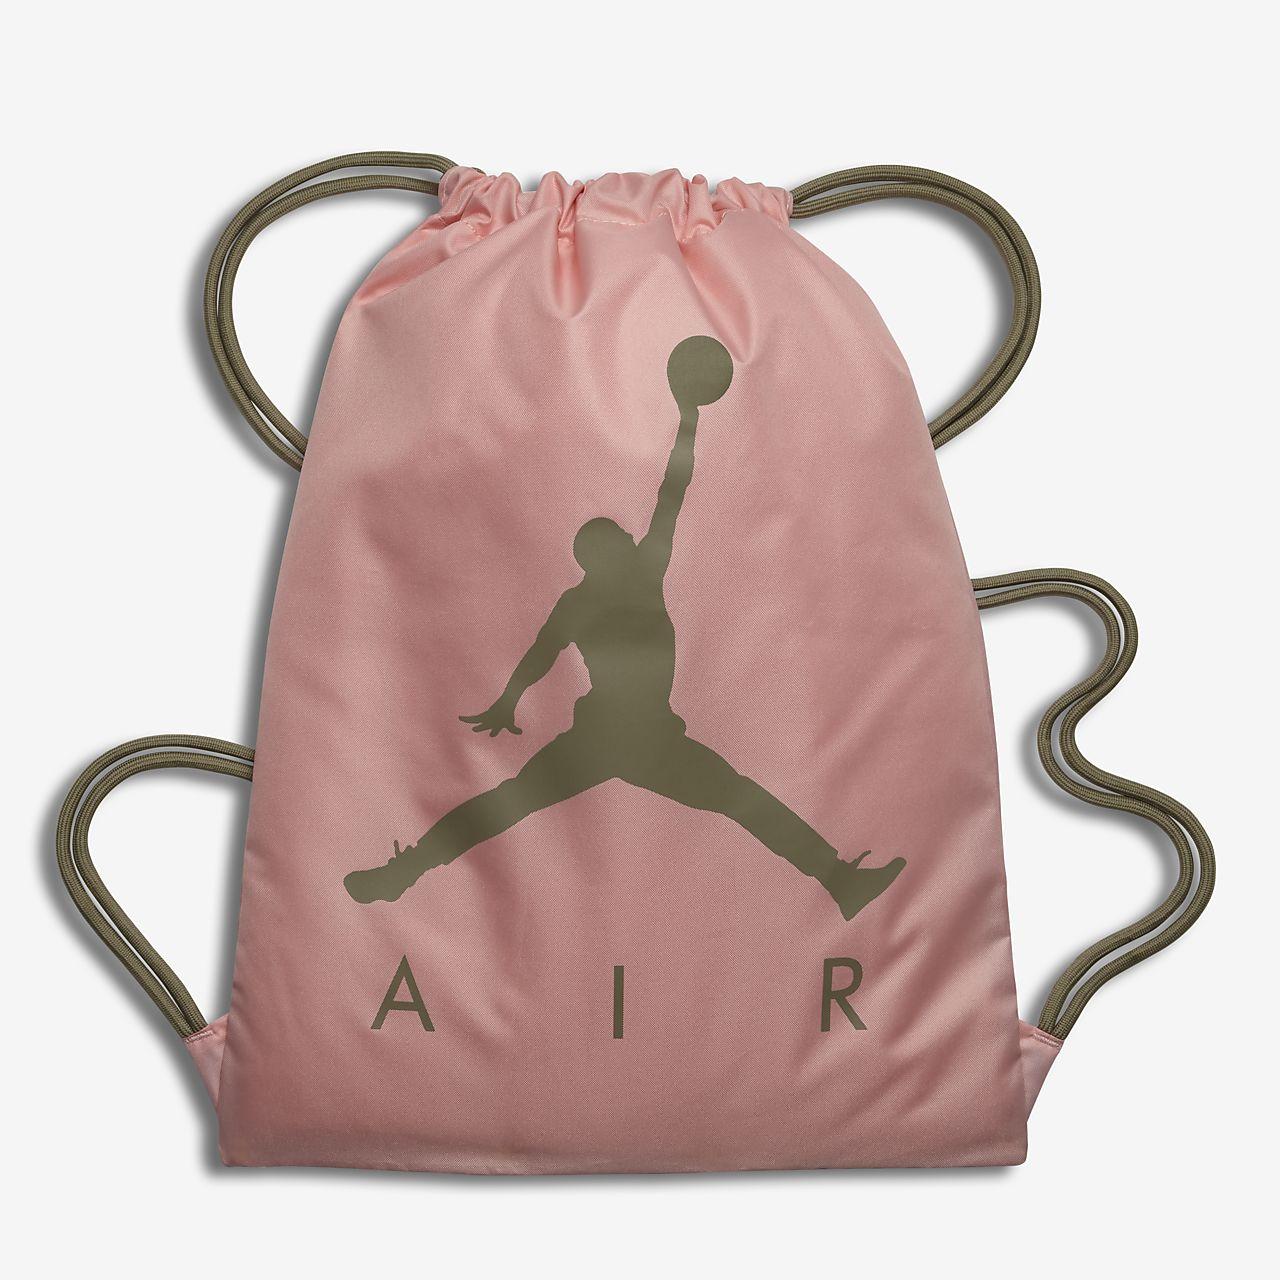 Sac de gym Air Jordan